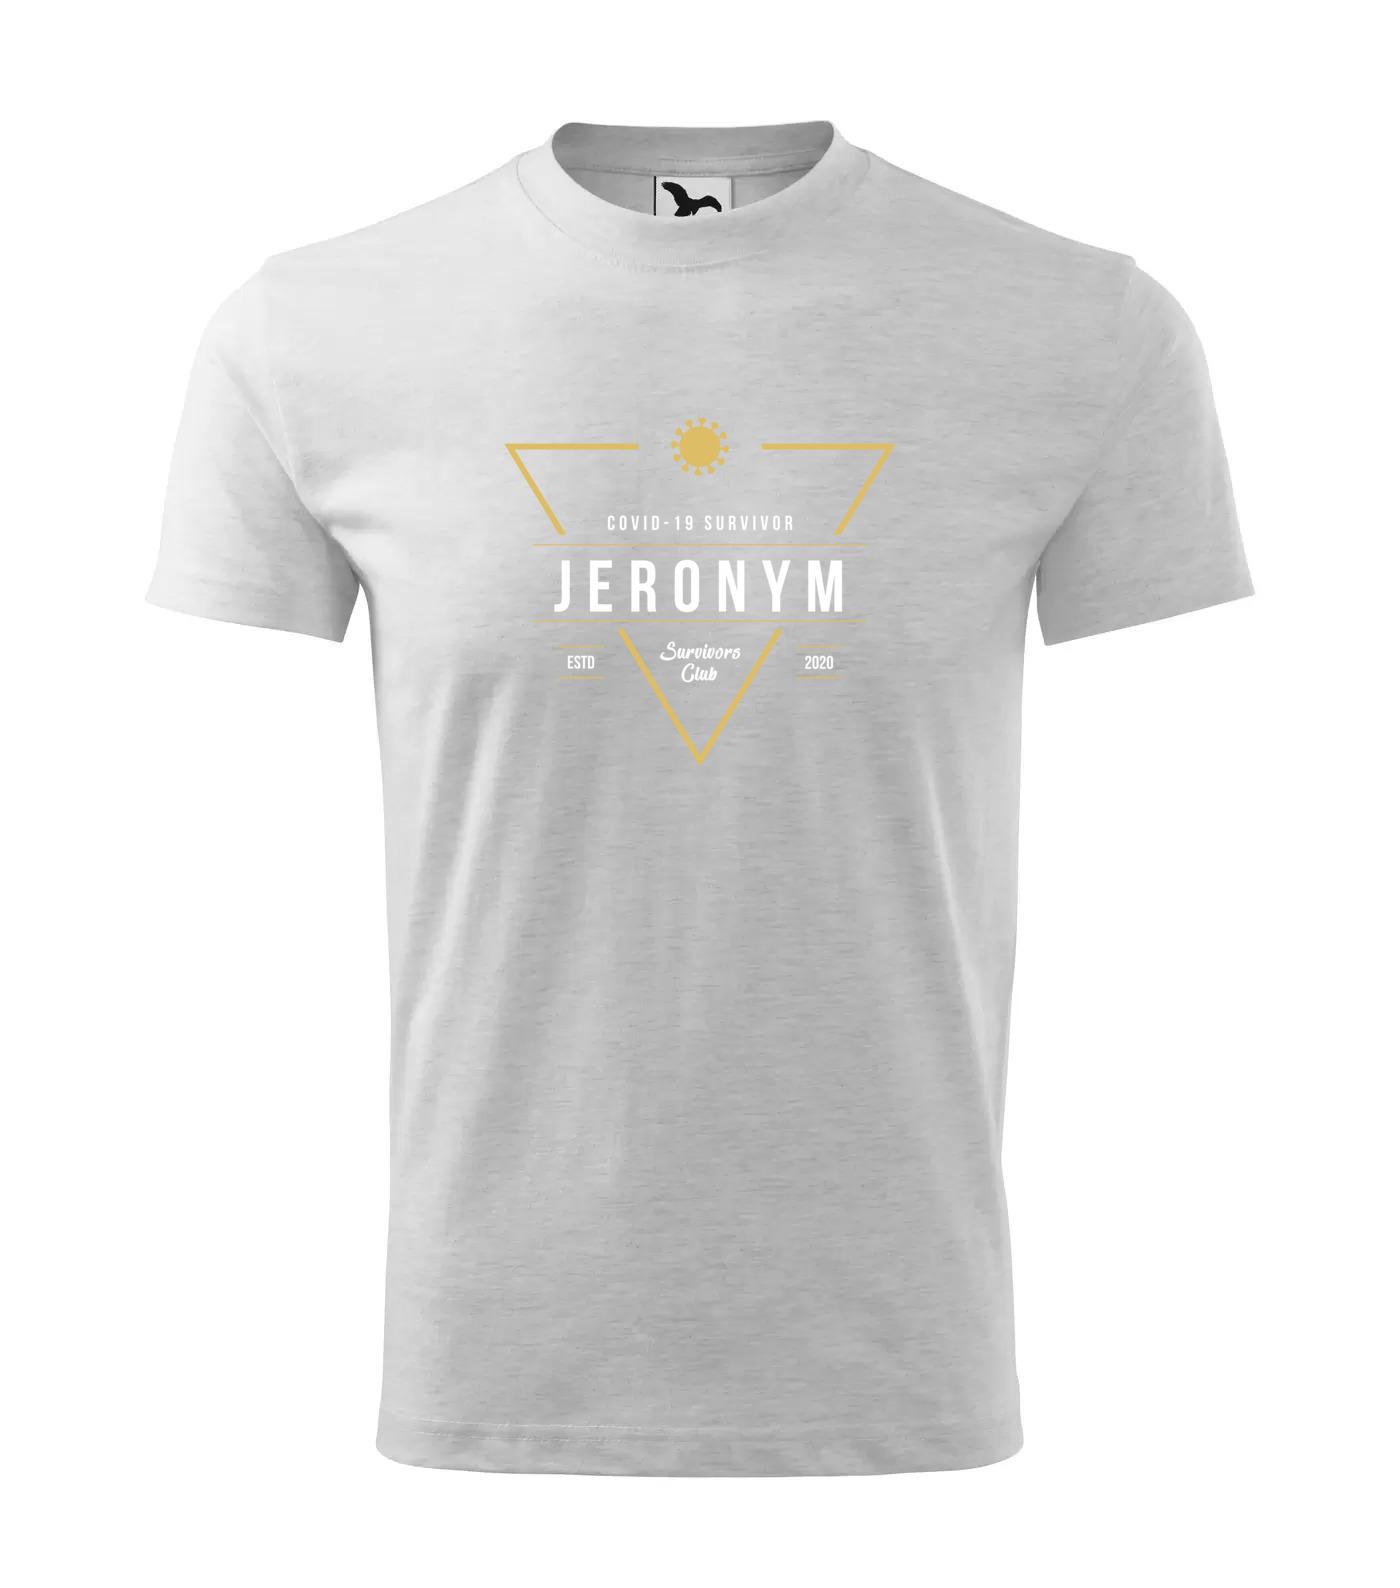 Tričko Survivor Club Jeronym